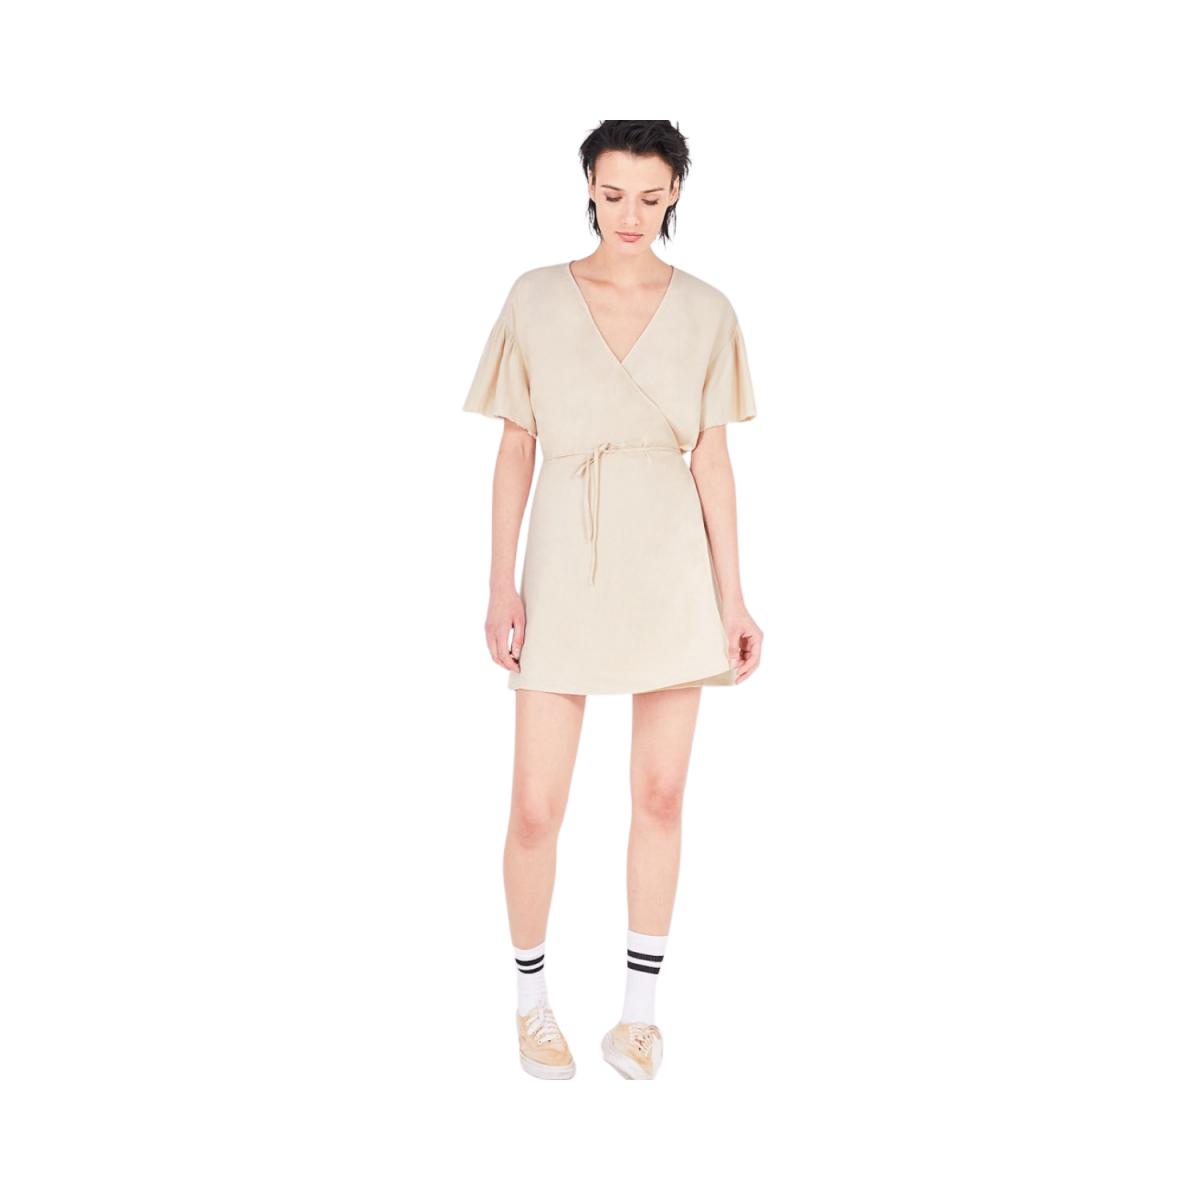 kunatata kjole - dove - model billede